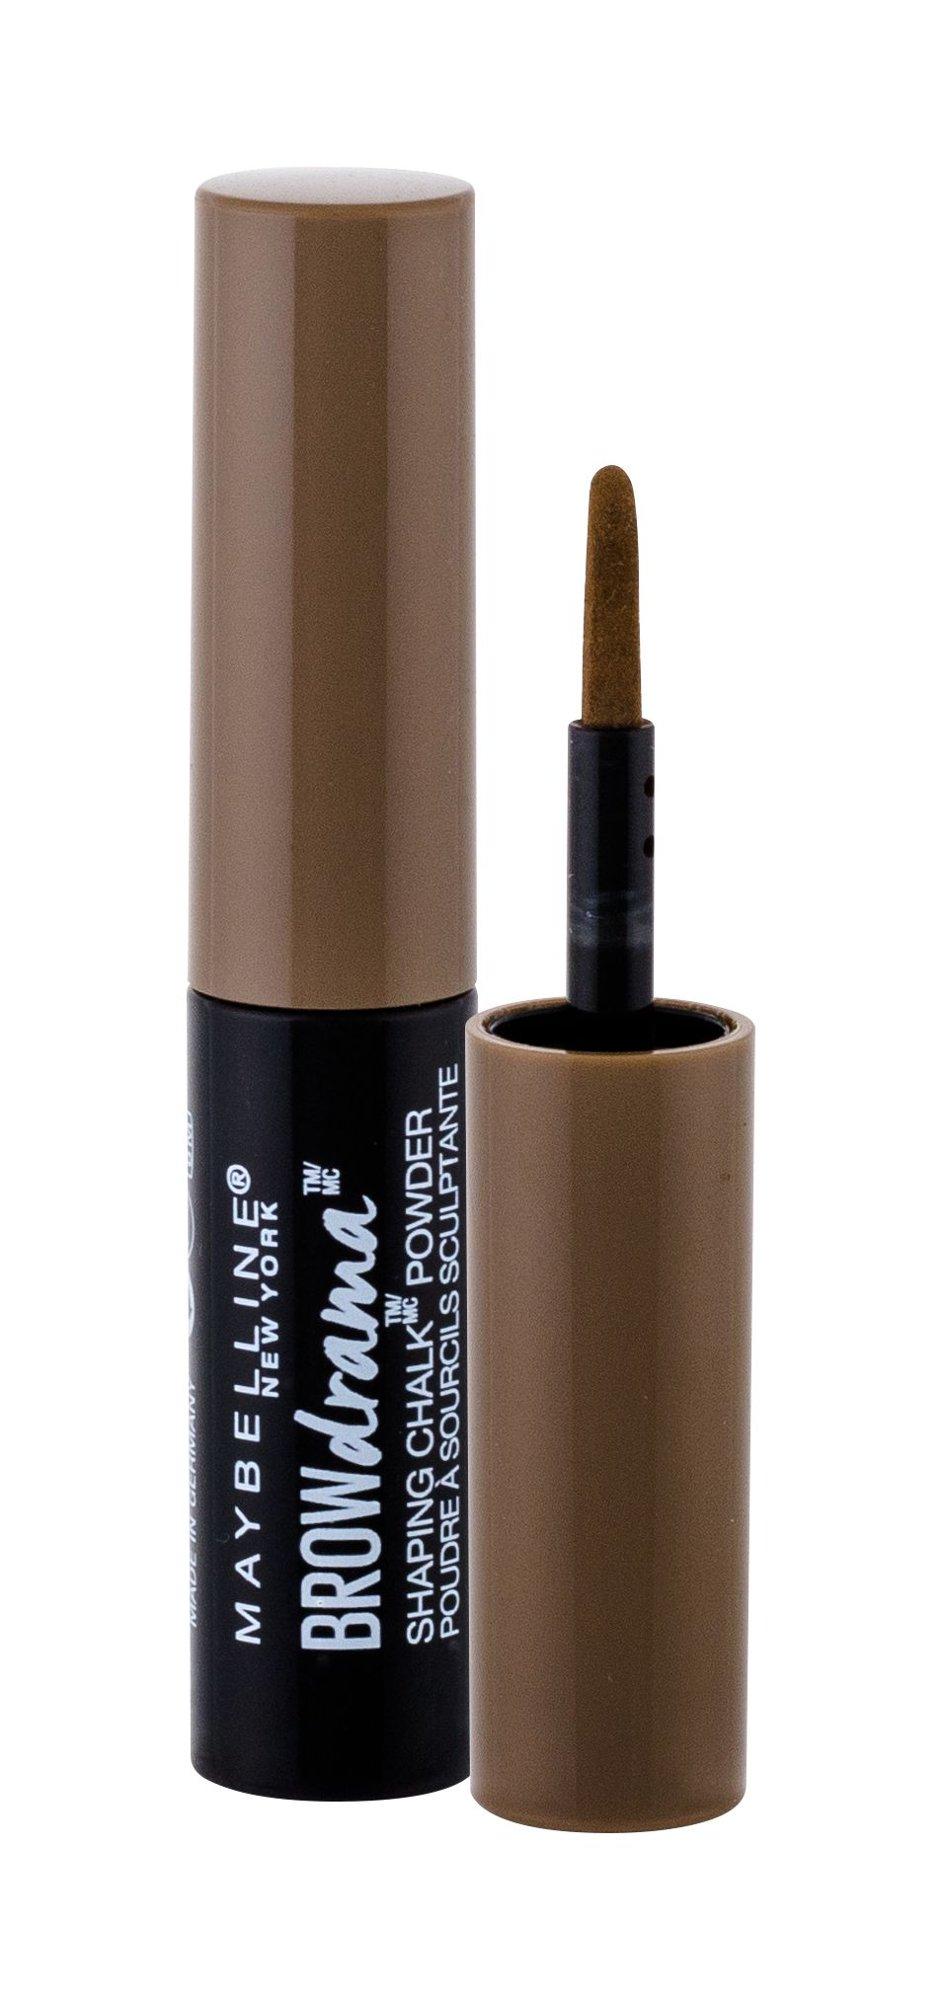 Maybelline Brow Drama Eyebrow Powder 1ml 120 Medium Brown